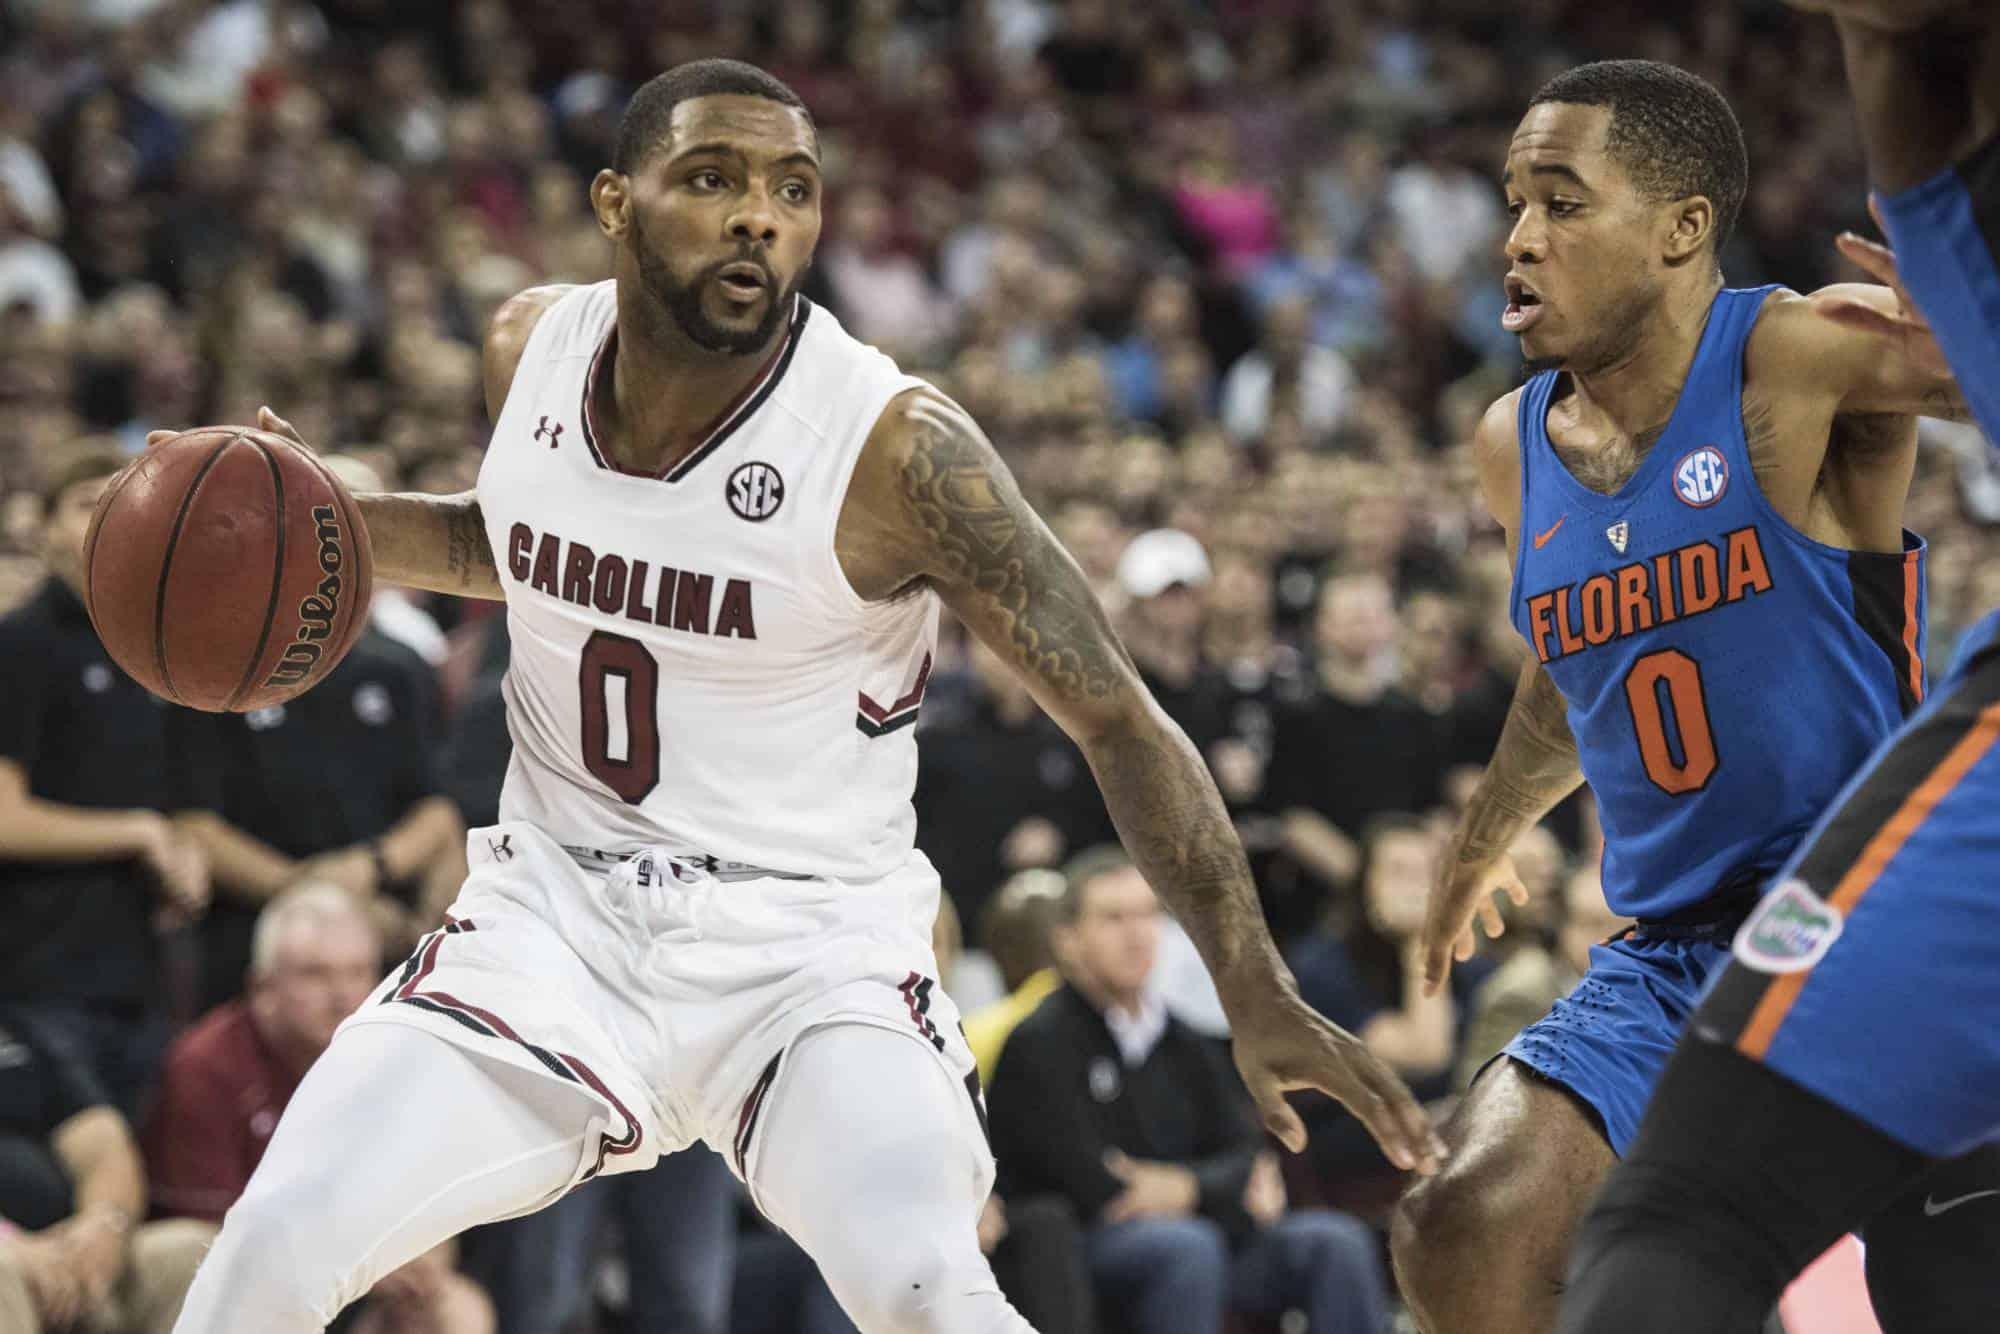 Ncaa basketball - Sindarius Thornwell - South Carolina